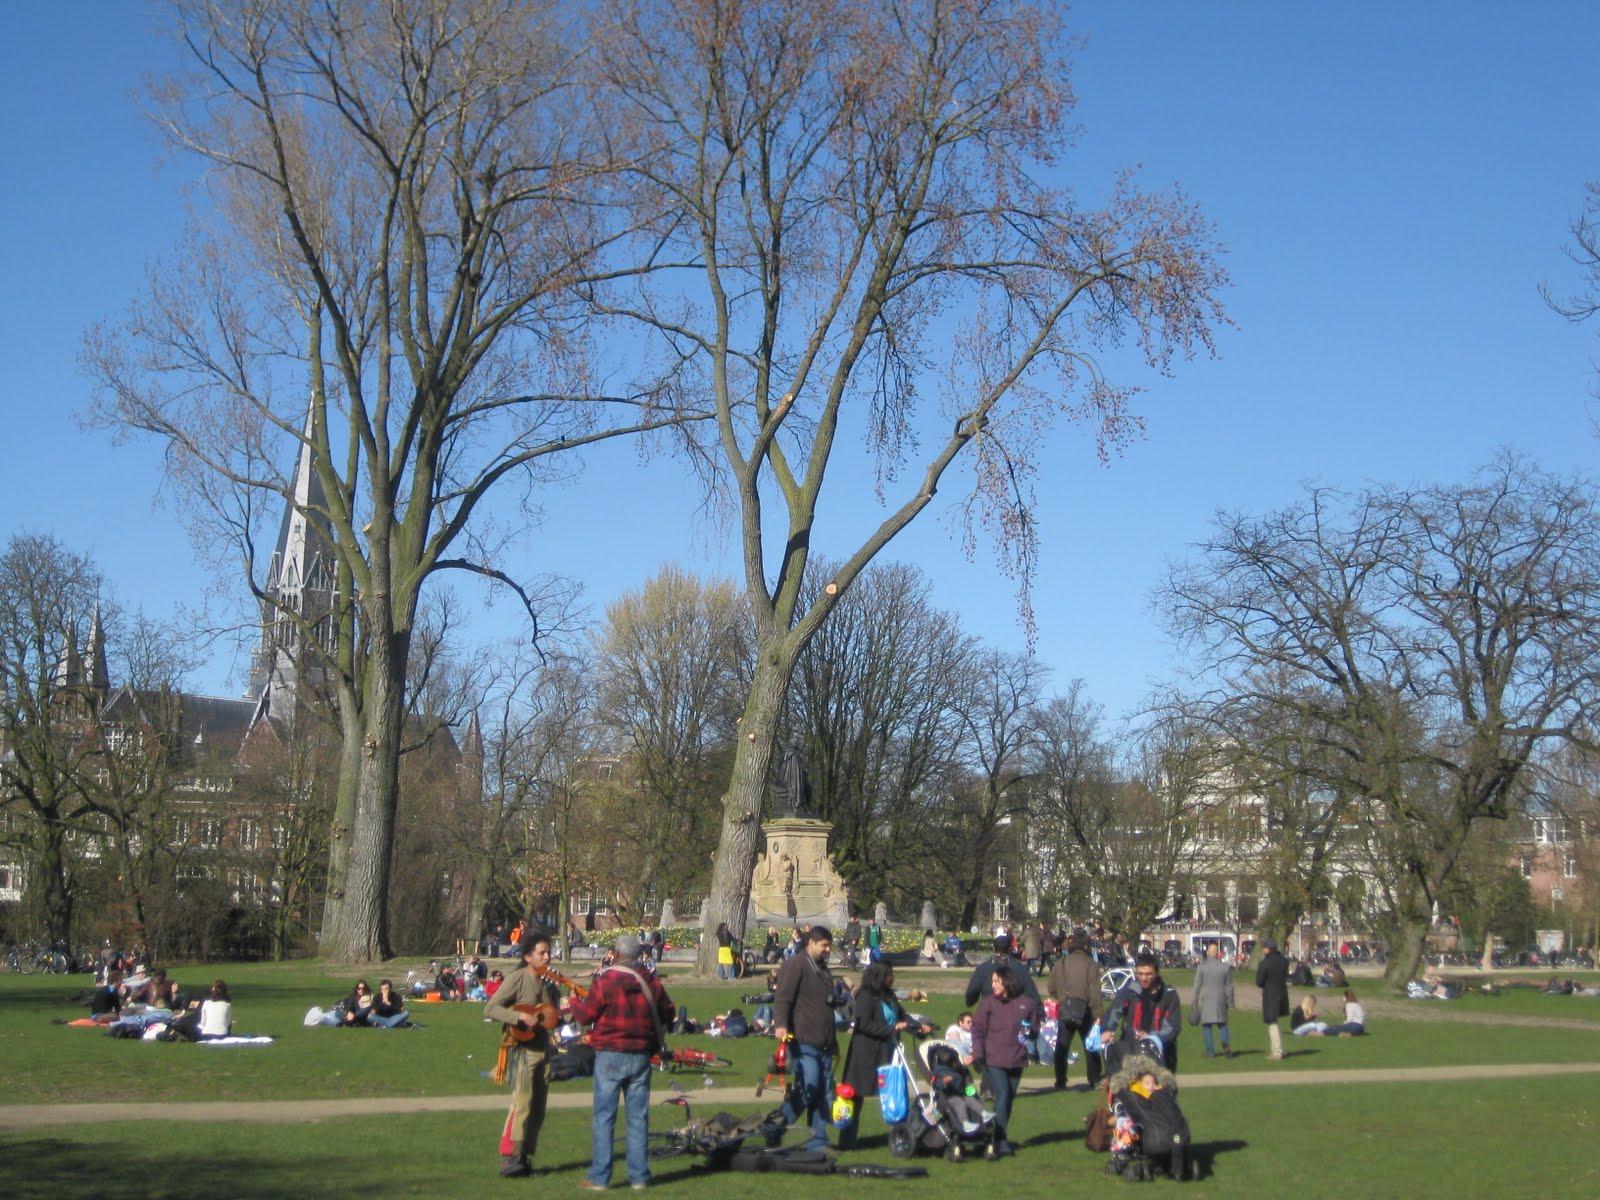 Spring in Vondel Park